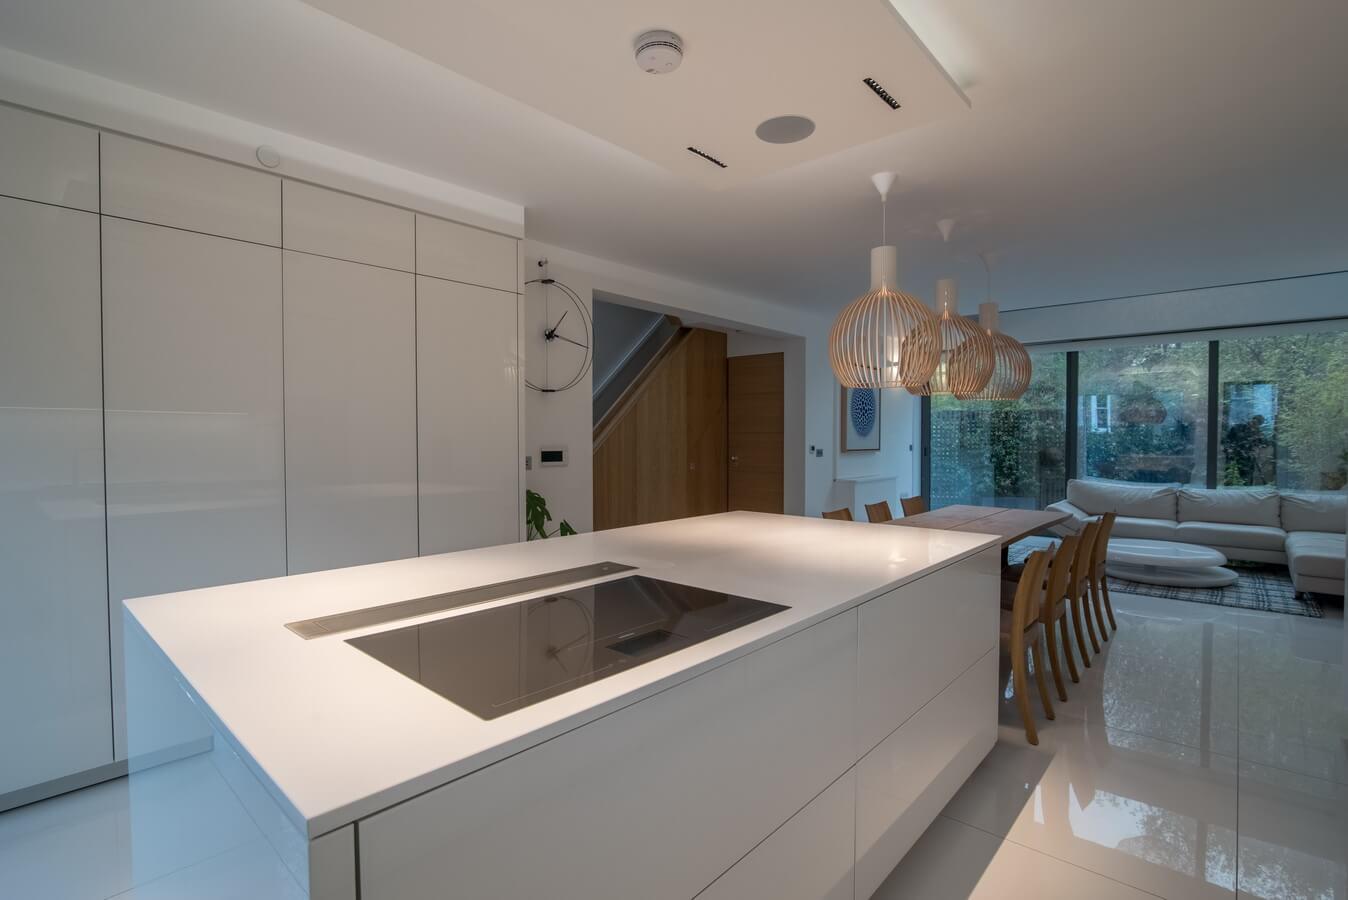 warendorf-germany-kitchen-1.jpg